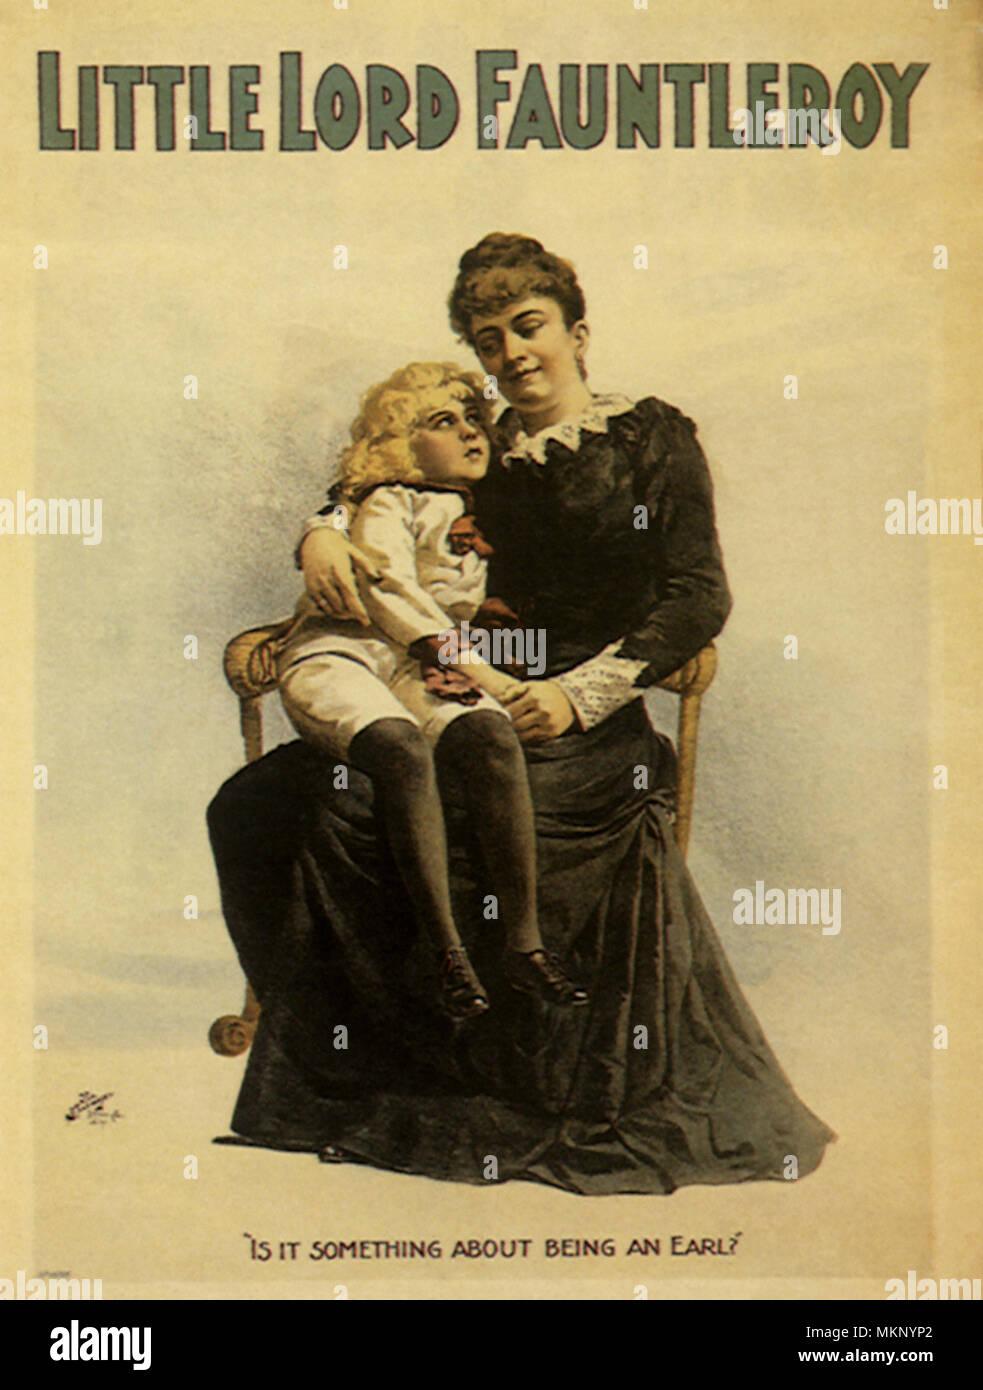 Little Lord Fauntleroy Stock Photo Alamy